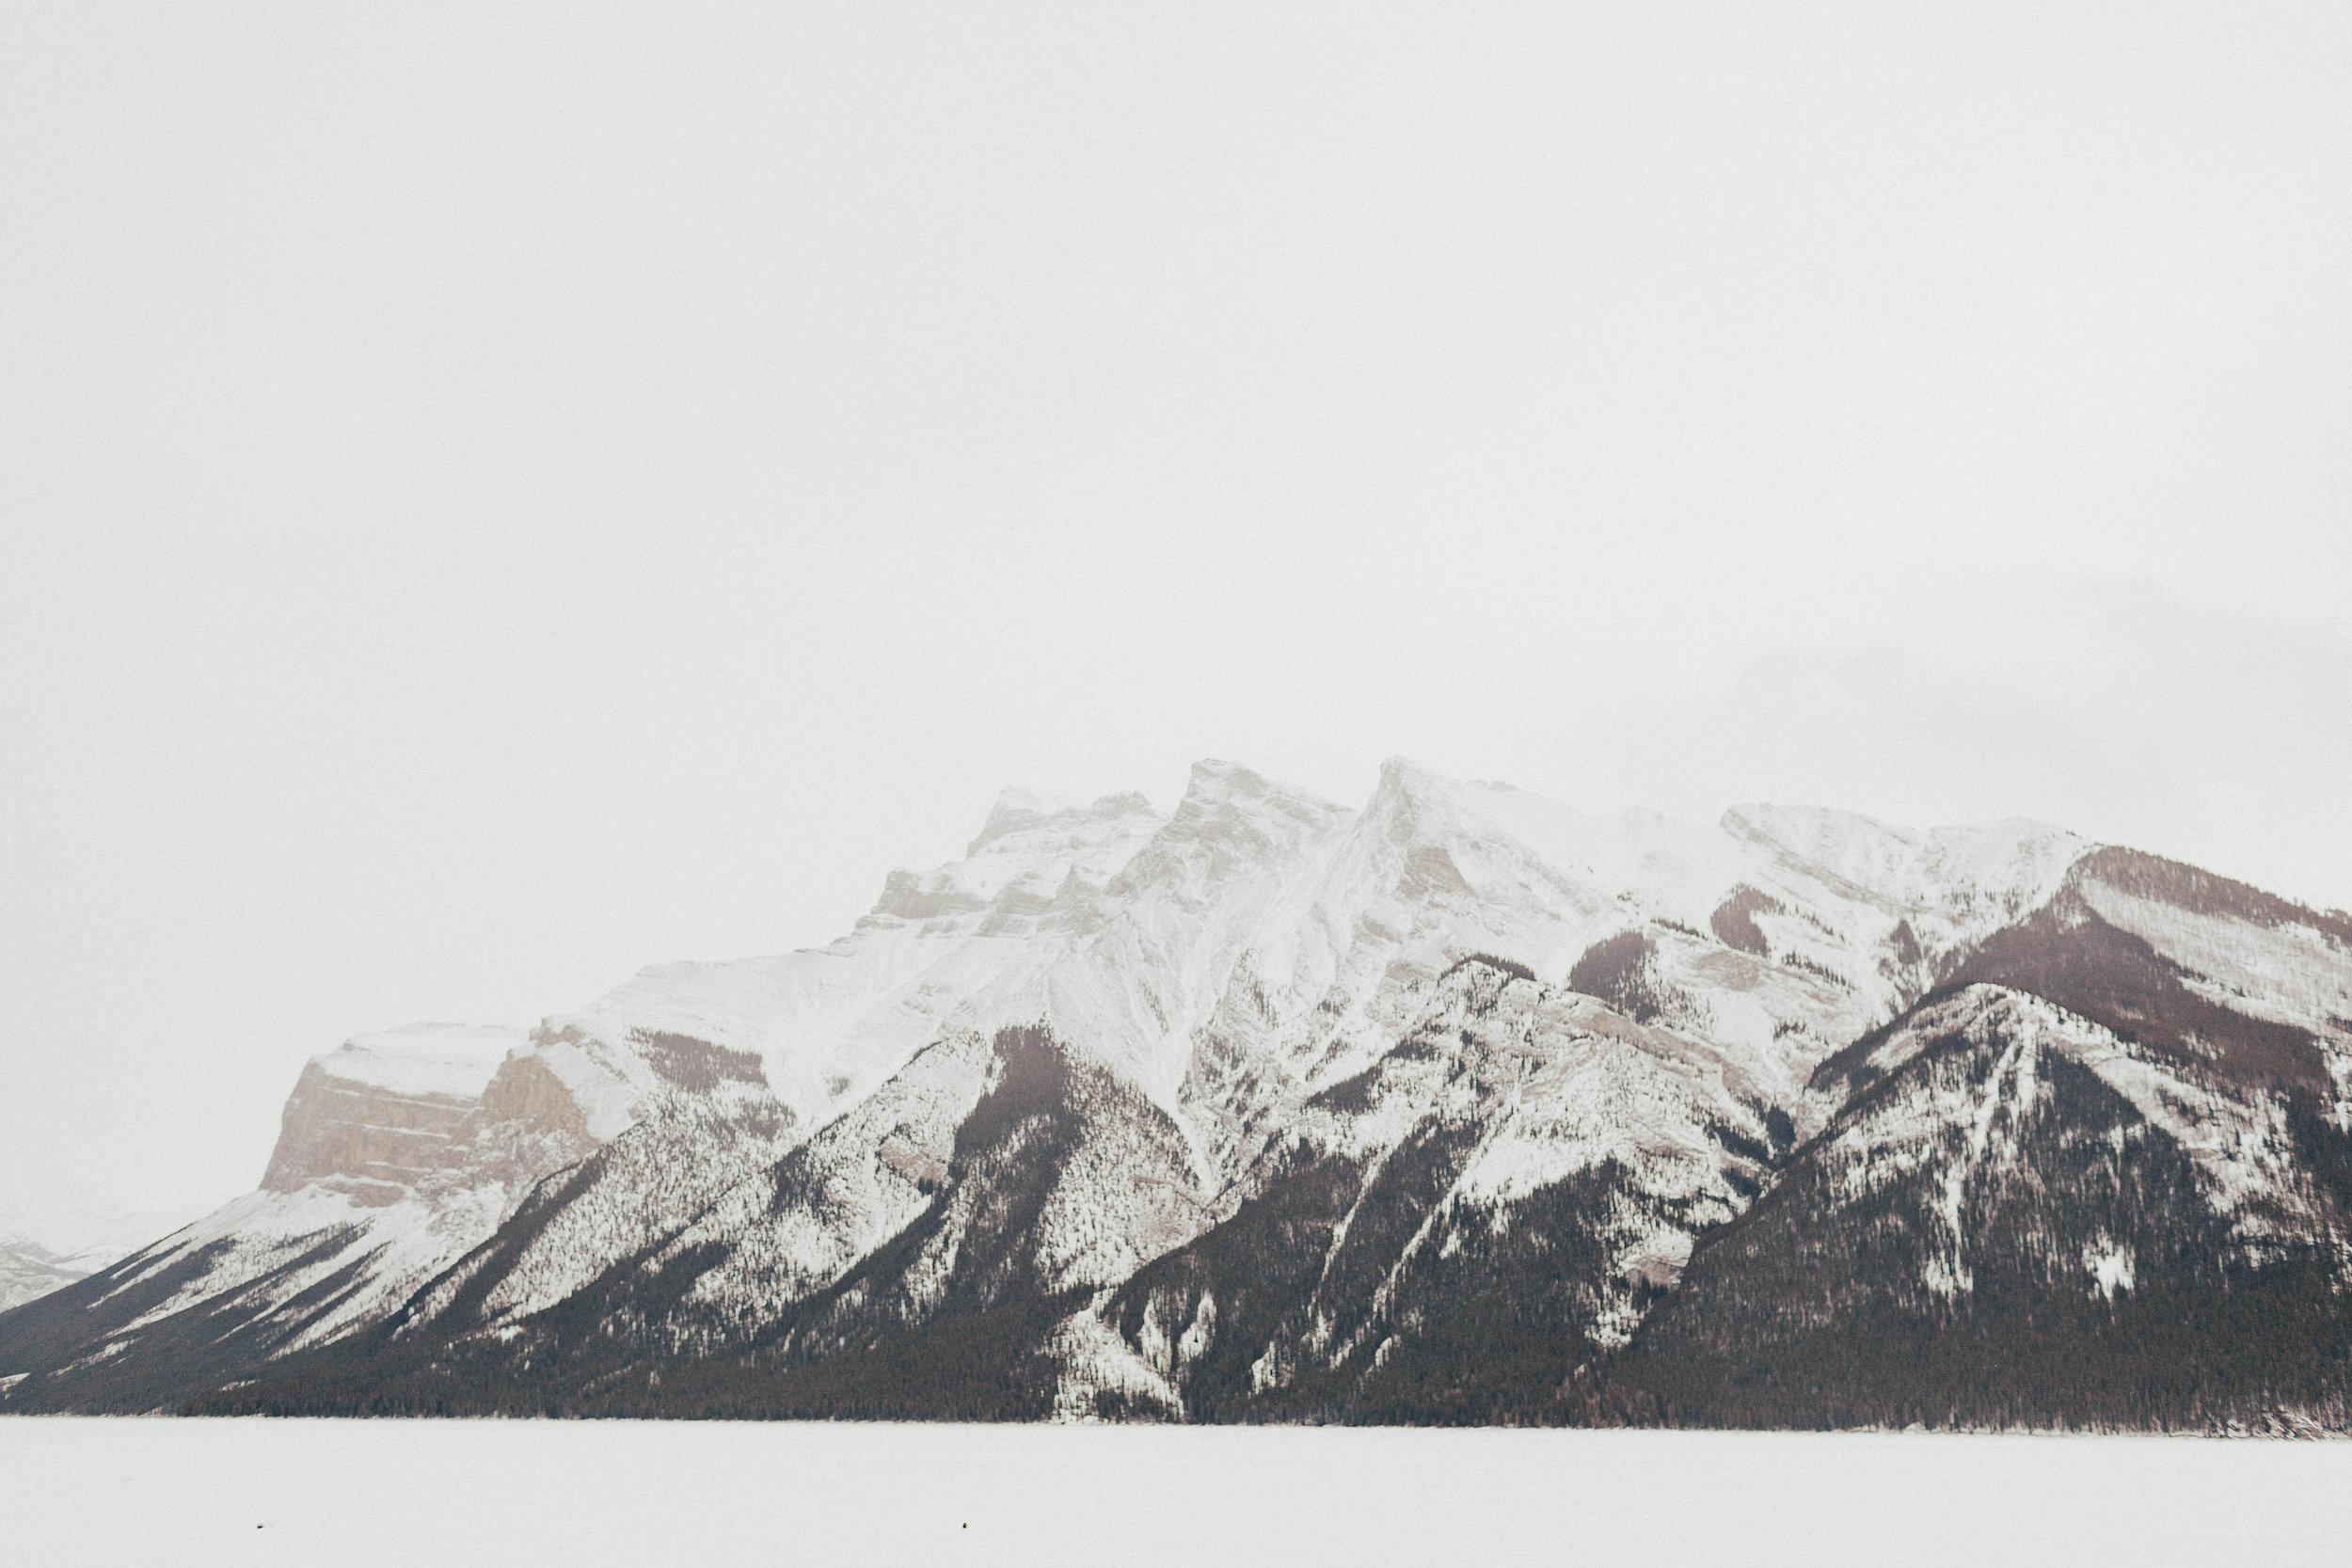 Banff Engagement Photographer - Winter Mountain Adventure Engagement Session - Michelle Larmand Photography-032